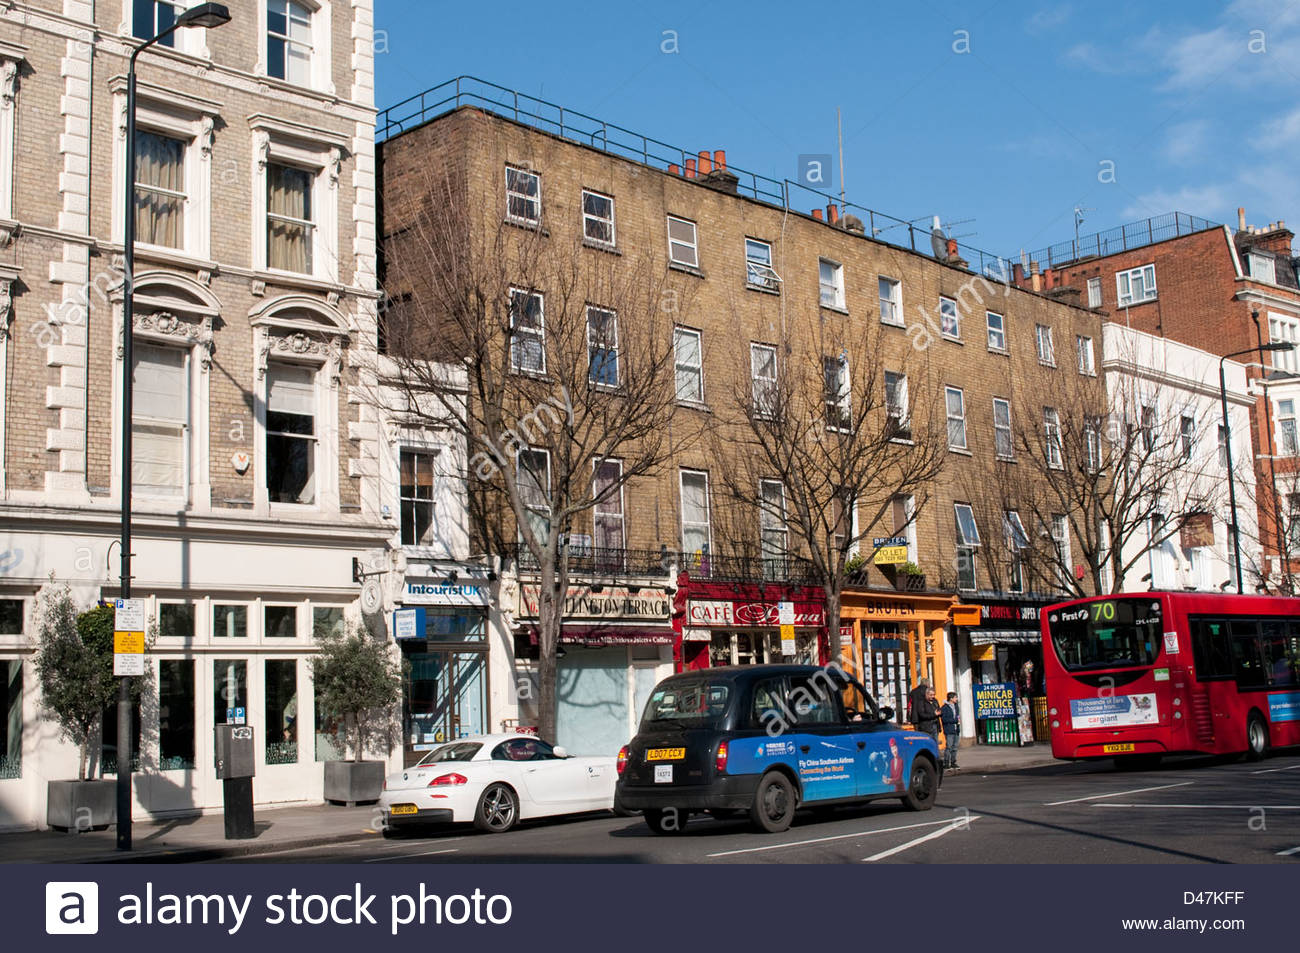 Bayswater Road, Notting Hill Gate, Kensington, London, W8, UK - Stock Image